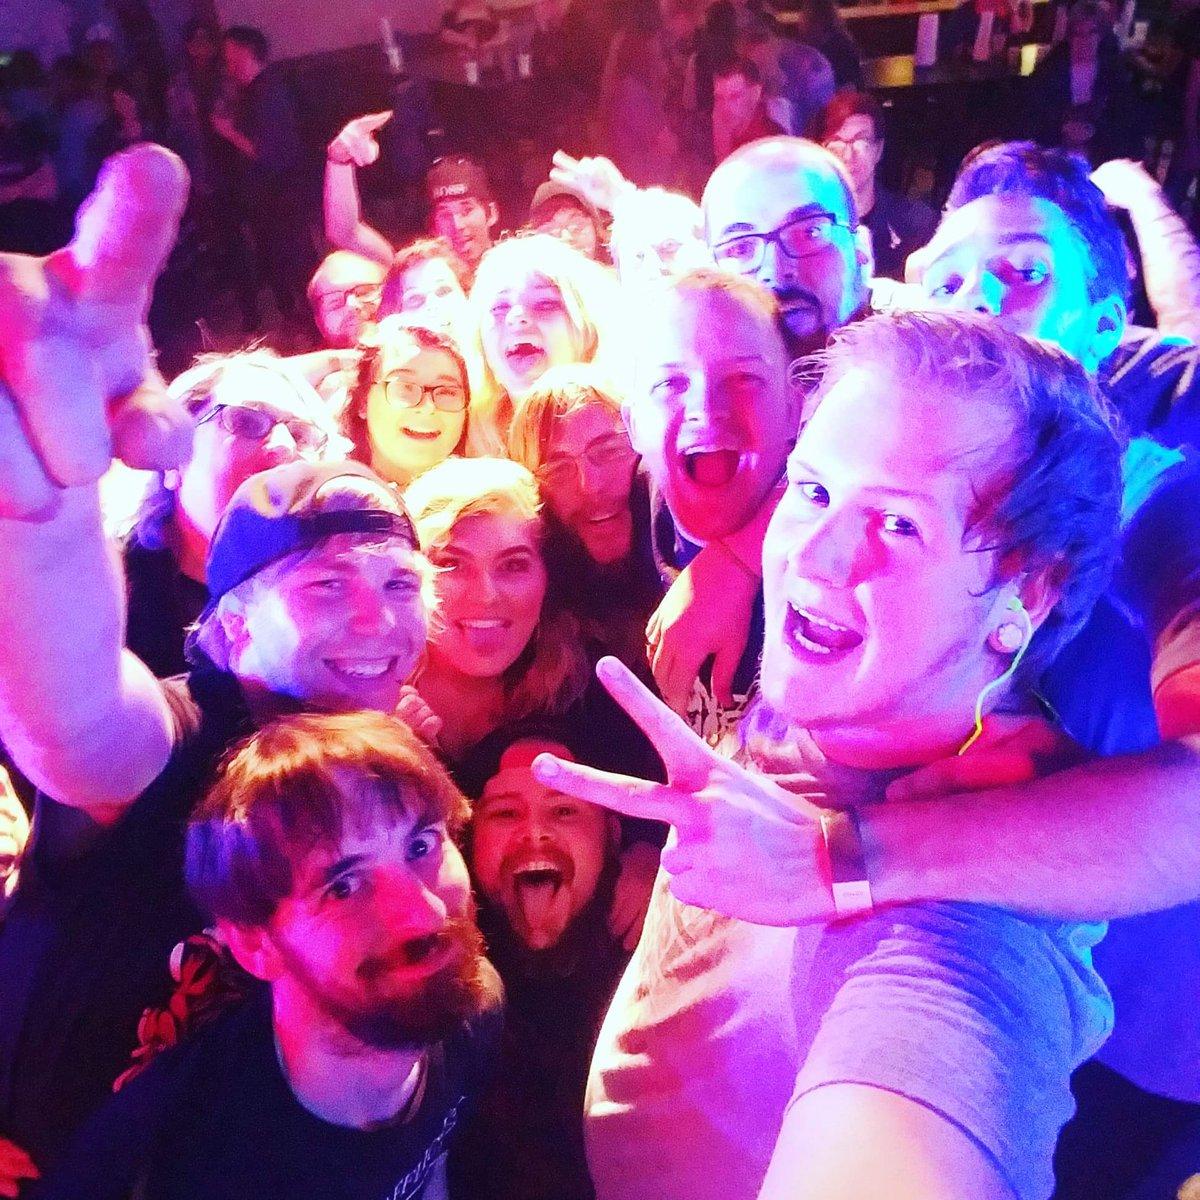 First time playing a bowling alley. Not bad at all! Til next time! #OSS #OssAtATime #Alternative #Rock #NewEP #SupportLocalMusic #LocalBands #Ohio #OhioBands #FollowMe #FollowUs #DefendPopPunk #FollowBack #Music #Like4Follow #InstaFollow #Retweet #AltRock<br>http://pic.twitter.com/aVW4WhjyJb